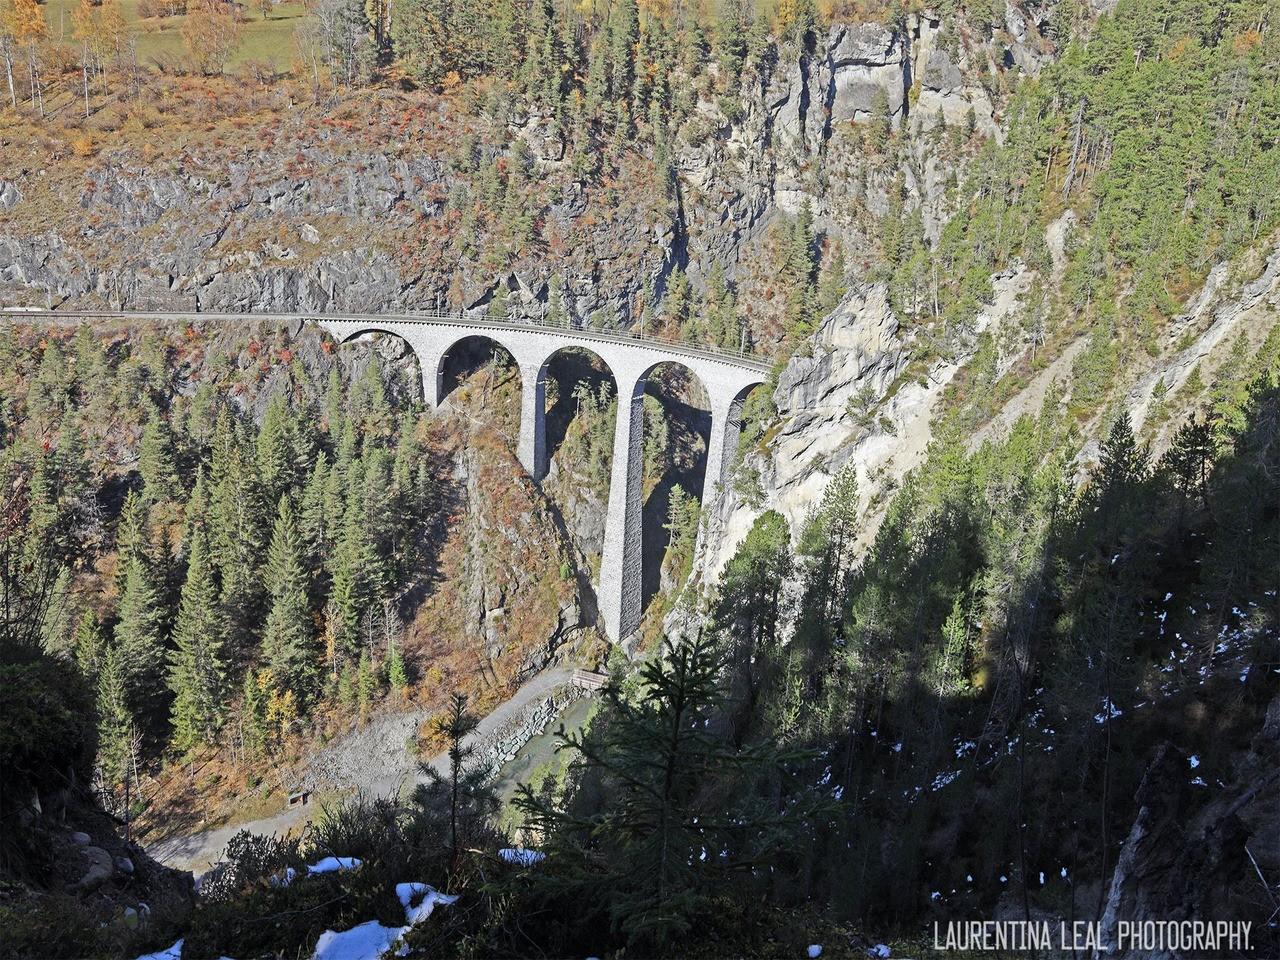 viaduto landwasser em filisur